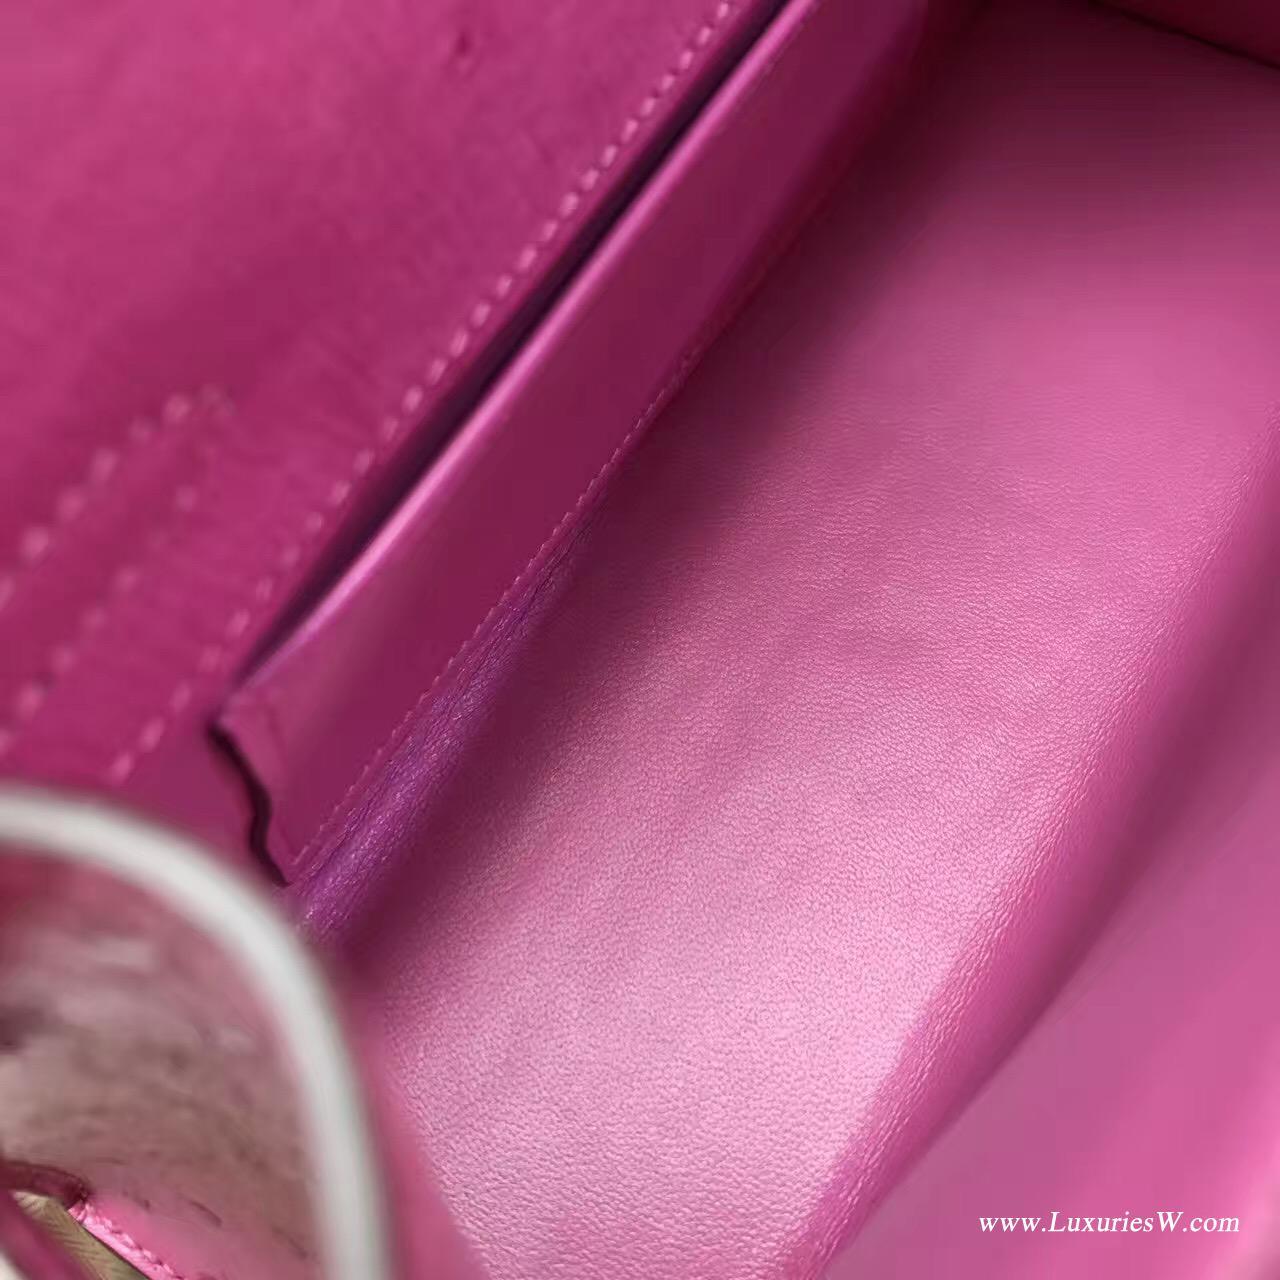 愛馬仕Hermes Minikelly壹代 Pochette鸵鸟E5 Rose Tyien 荧光粉色 金色金属